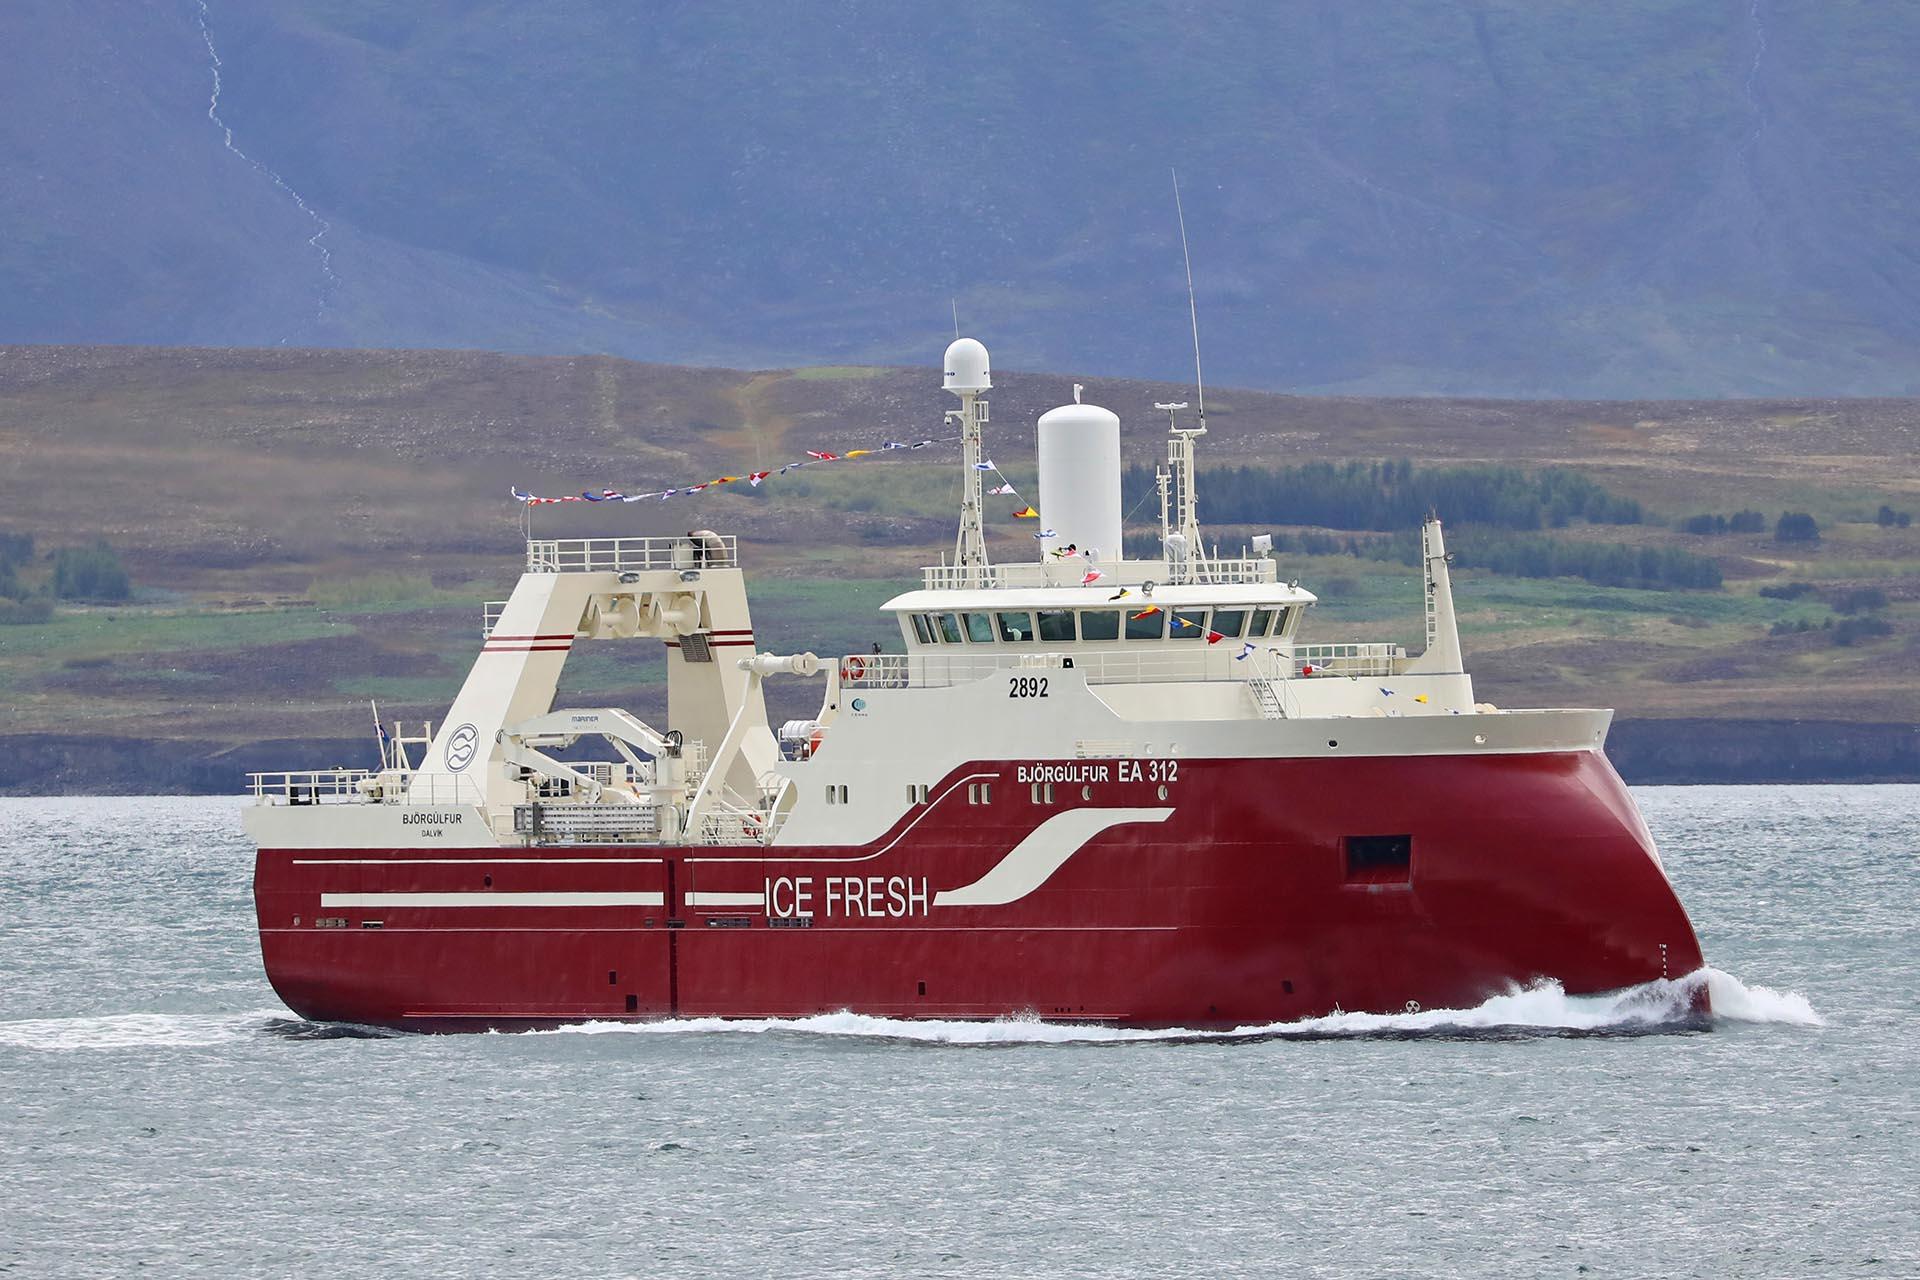 Slippurinn Akureyri will deliver turnkey solutions in fresh fish vessels Kaldbakur EA 1 and Björgúlfur 312 for Samherji.